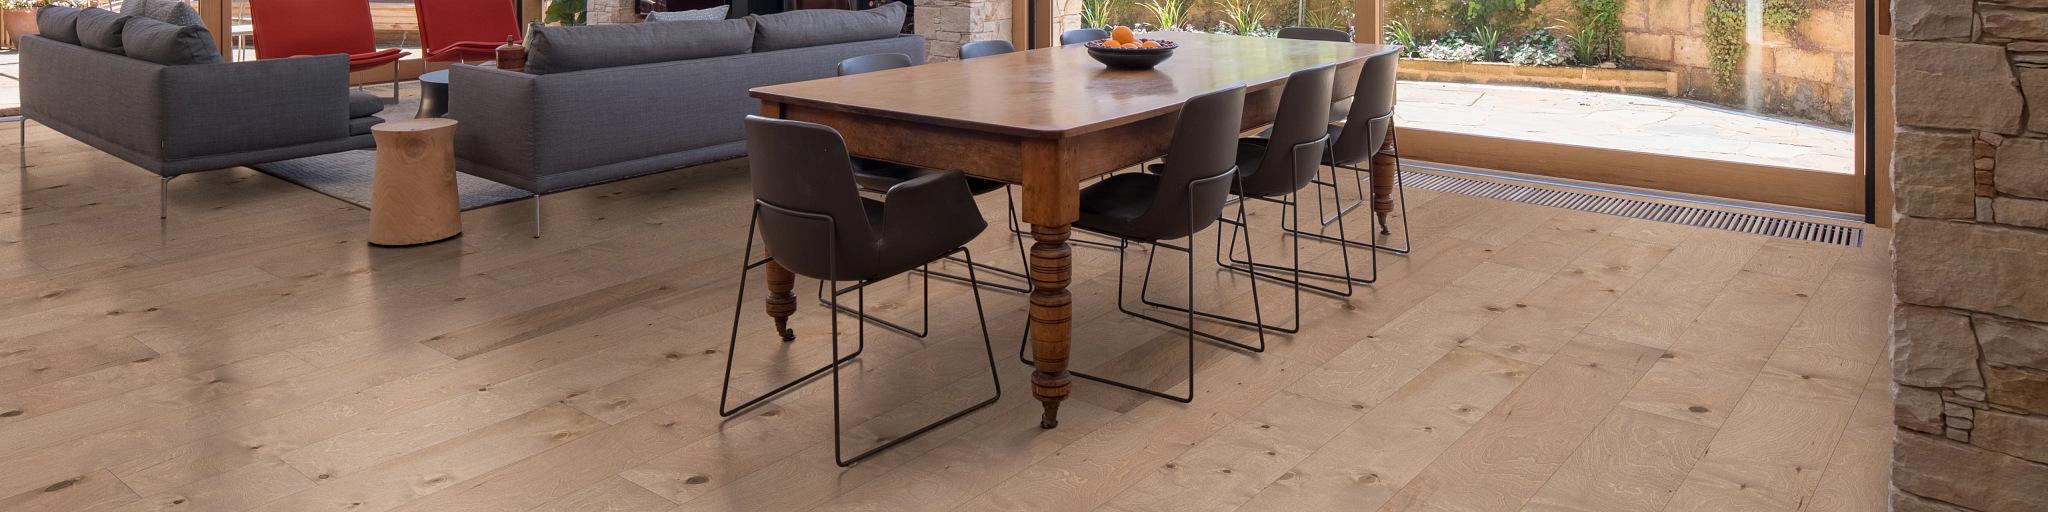 Hardwood-Repel-Engineered-Celestial-SW744-02061-Wicker-Dinning-Room-2021